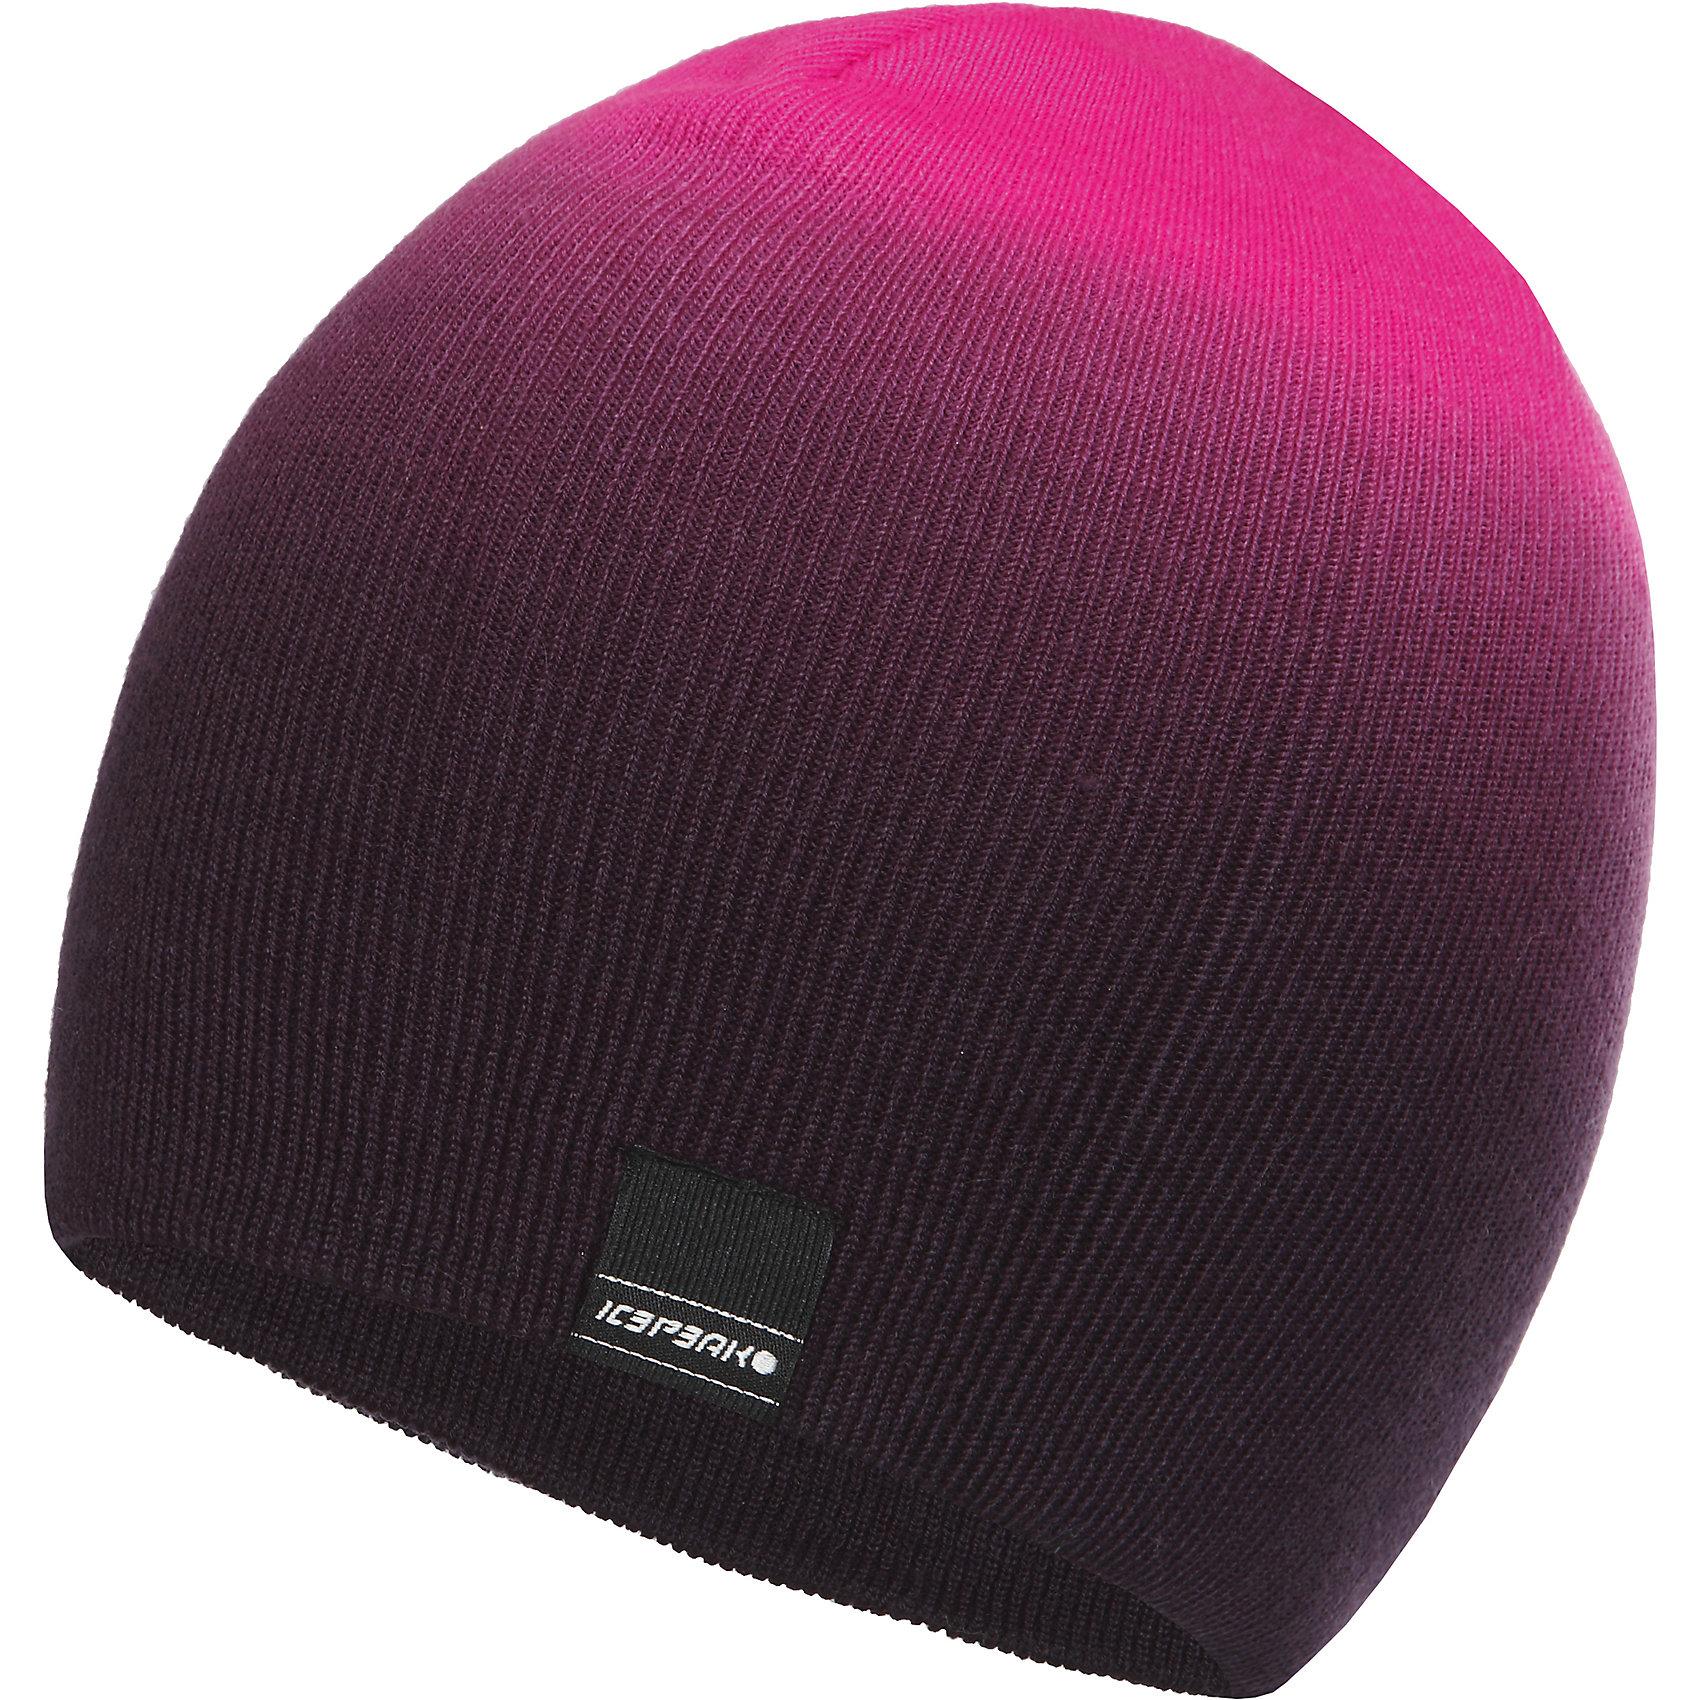 ICEPEAK Шапка-шлем для мальчика ICEPEAK icepeak шапка icepeak